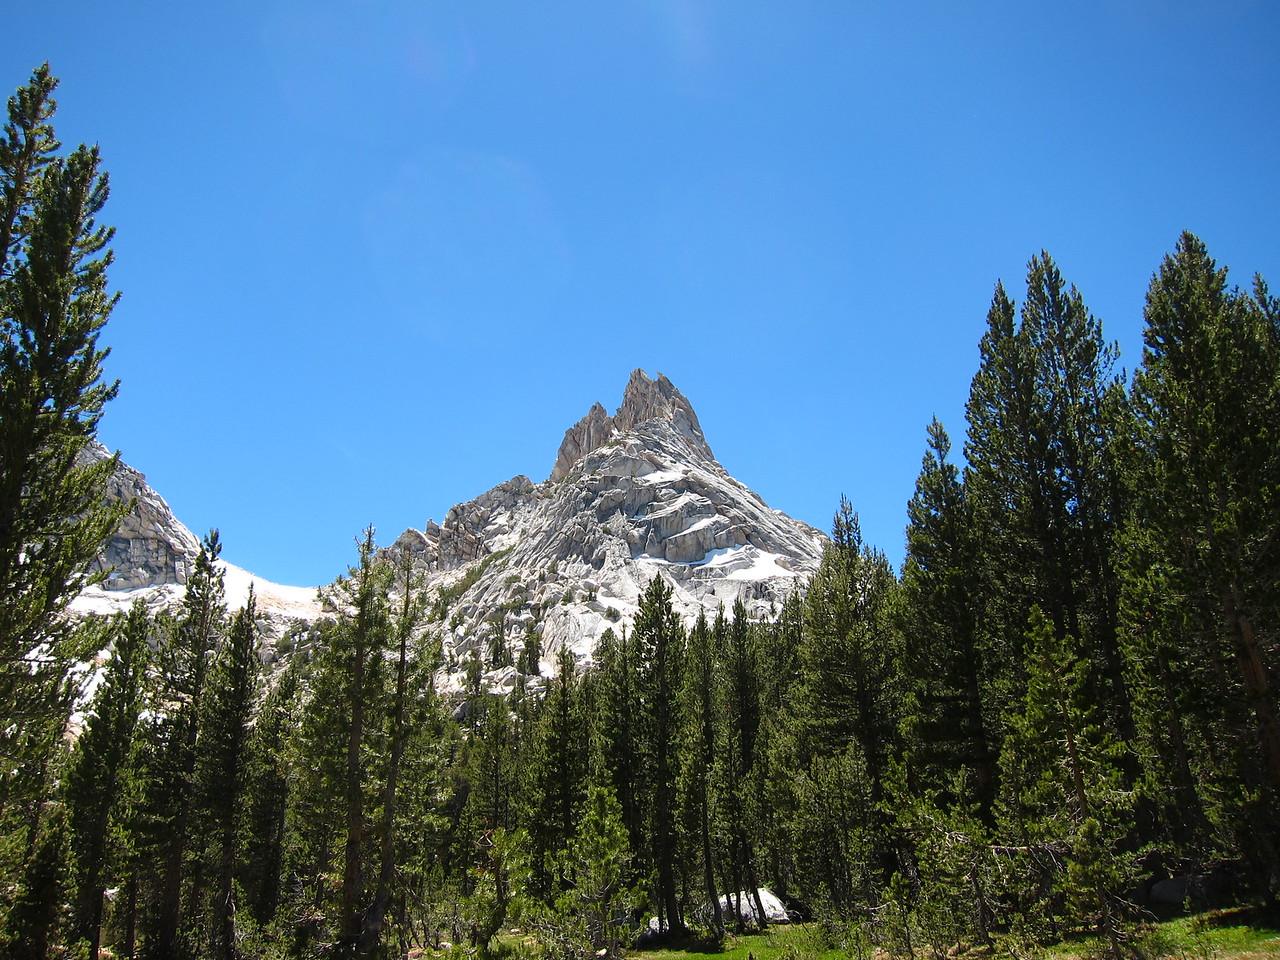 Ragged Peak, by Young lake